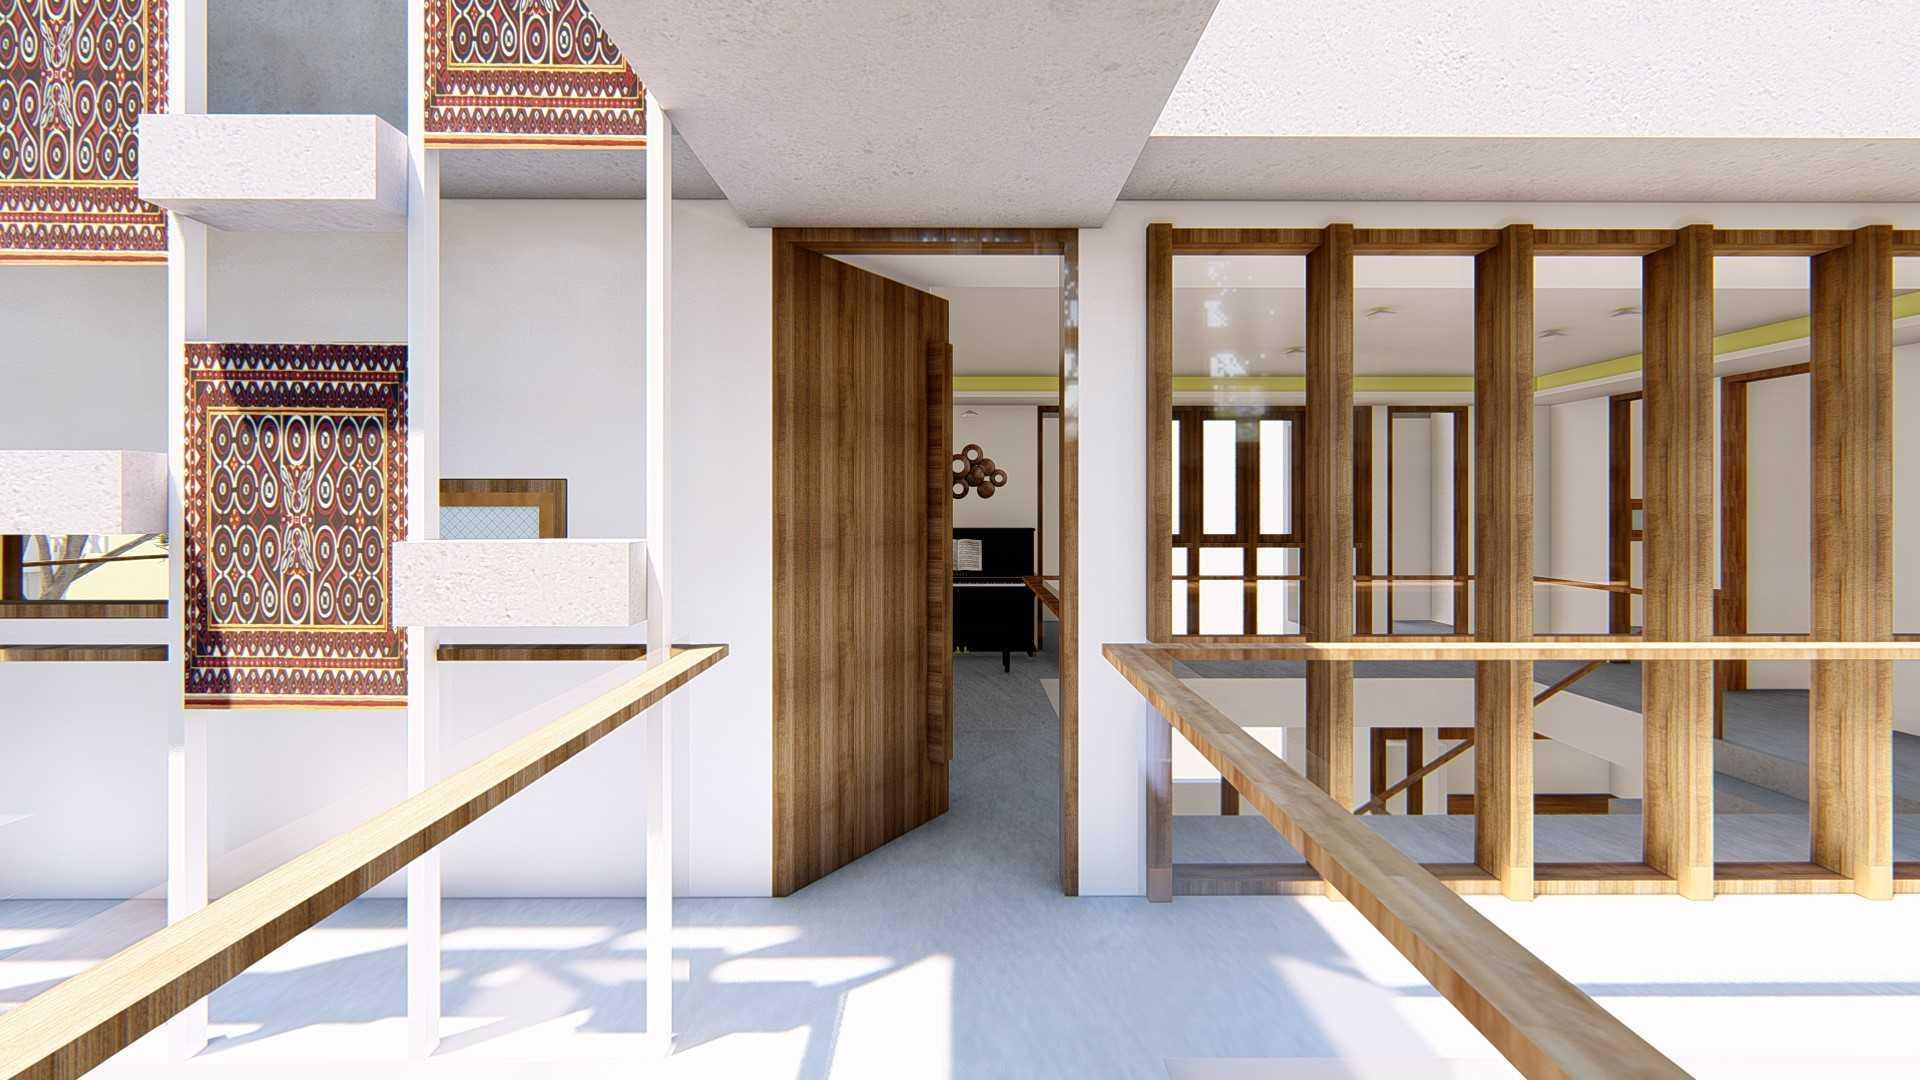 Guntur Haryadi Architecture Studio Tr Villa Nana' Nanggala, Nanggala, Kabupaten Toraja Utara, Sulawesi Selatan, Indonesia  Guntur-Haryadi-Architecture-Studio-Tr-Villa   65574